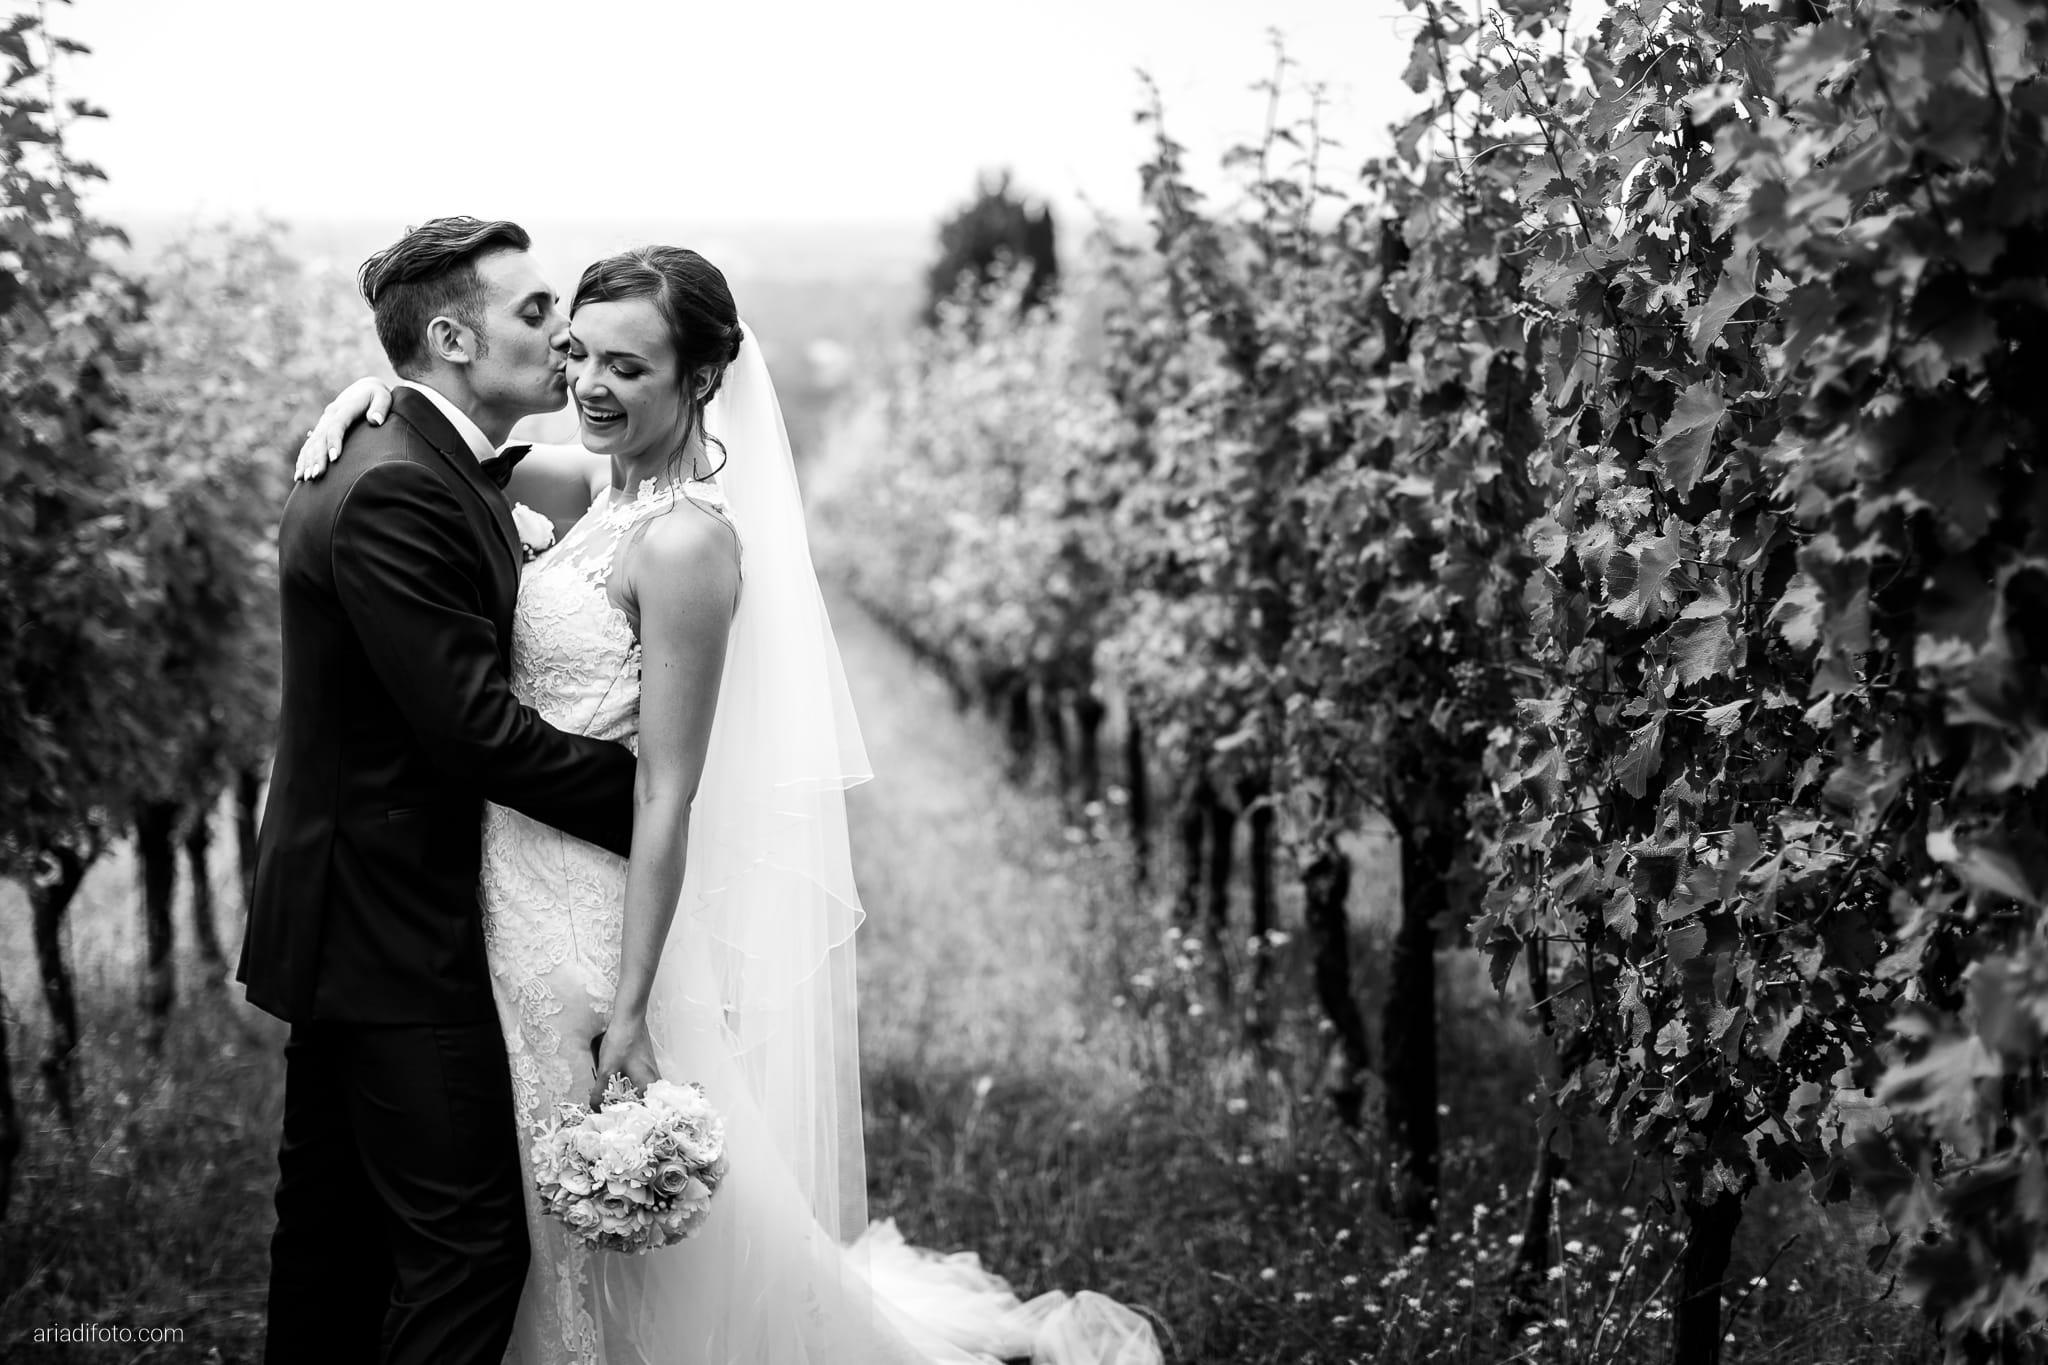 Valentina Marco Matrimonio Duomo Gorizia Castelvecchio Sagrado ritratti sposi vigne